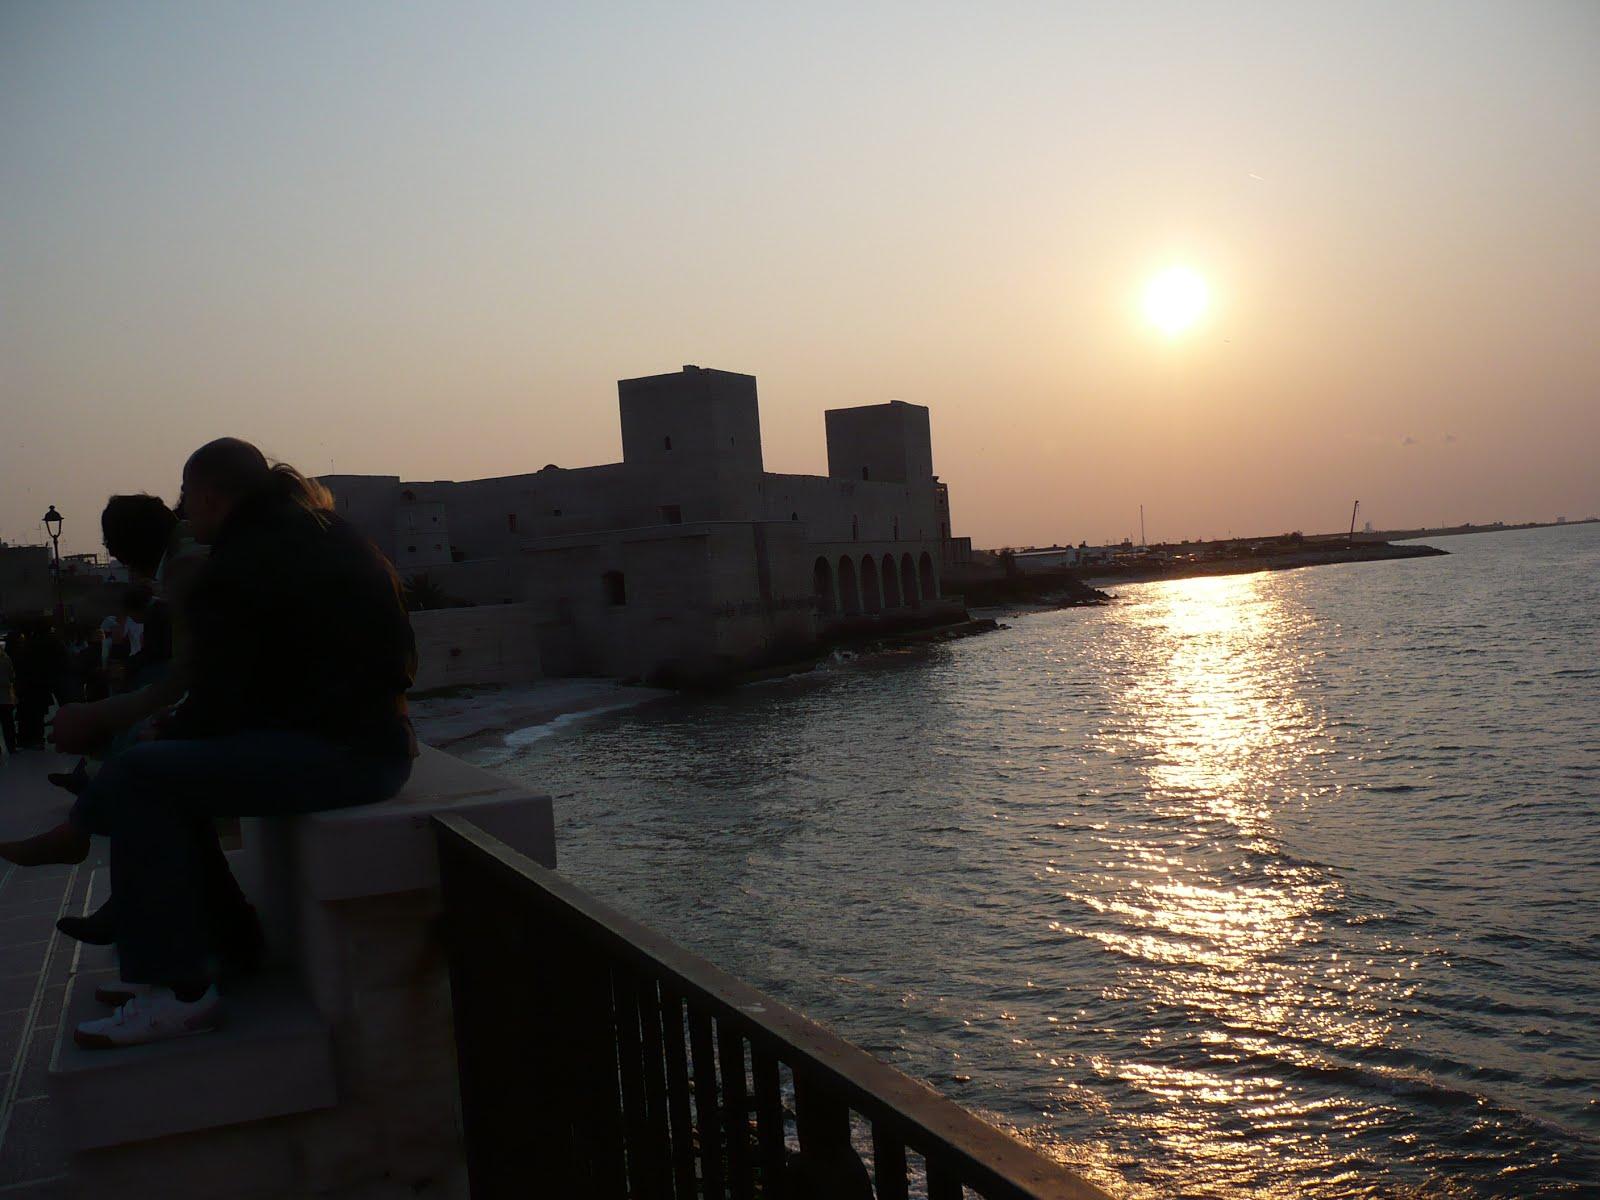 tramonto tranese